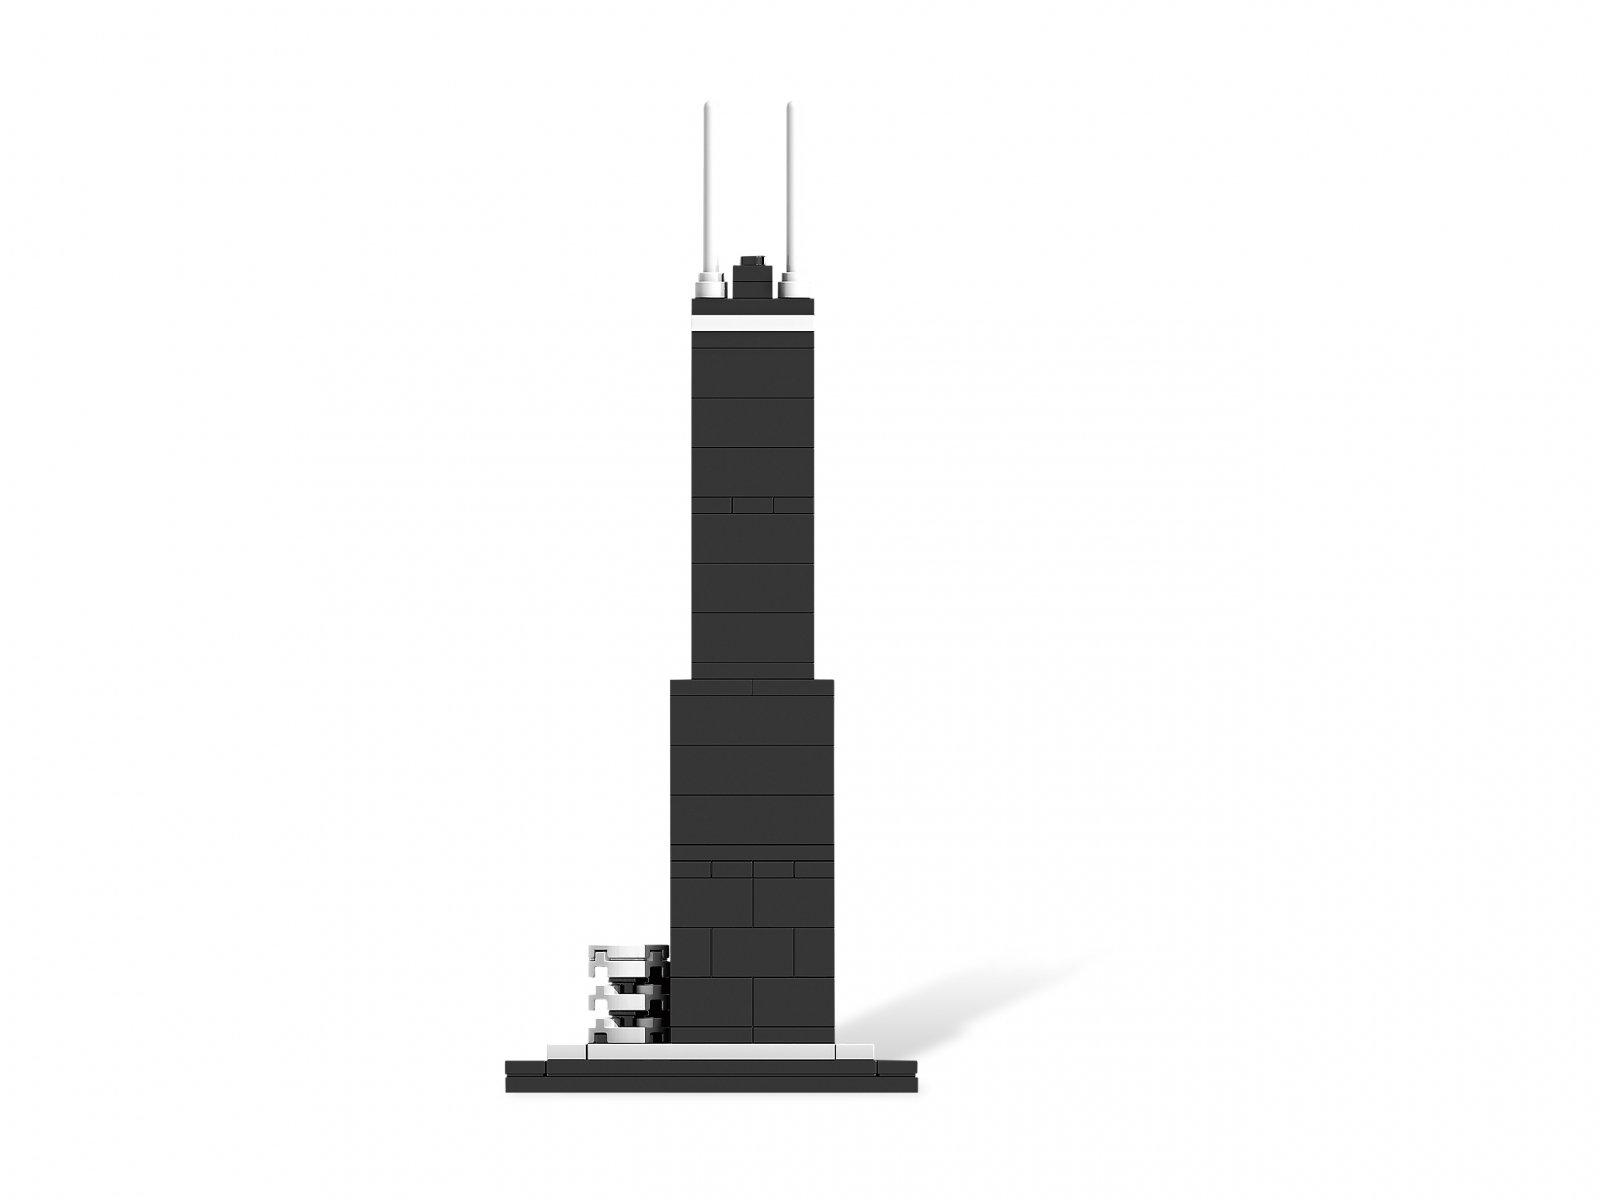 LEGO 21001 John Hancock Center